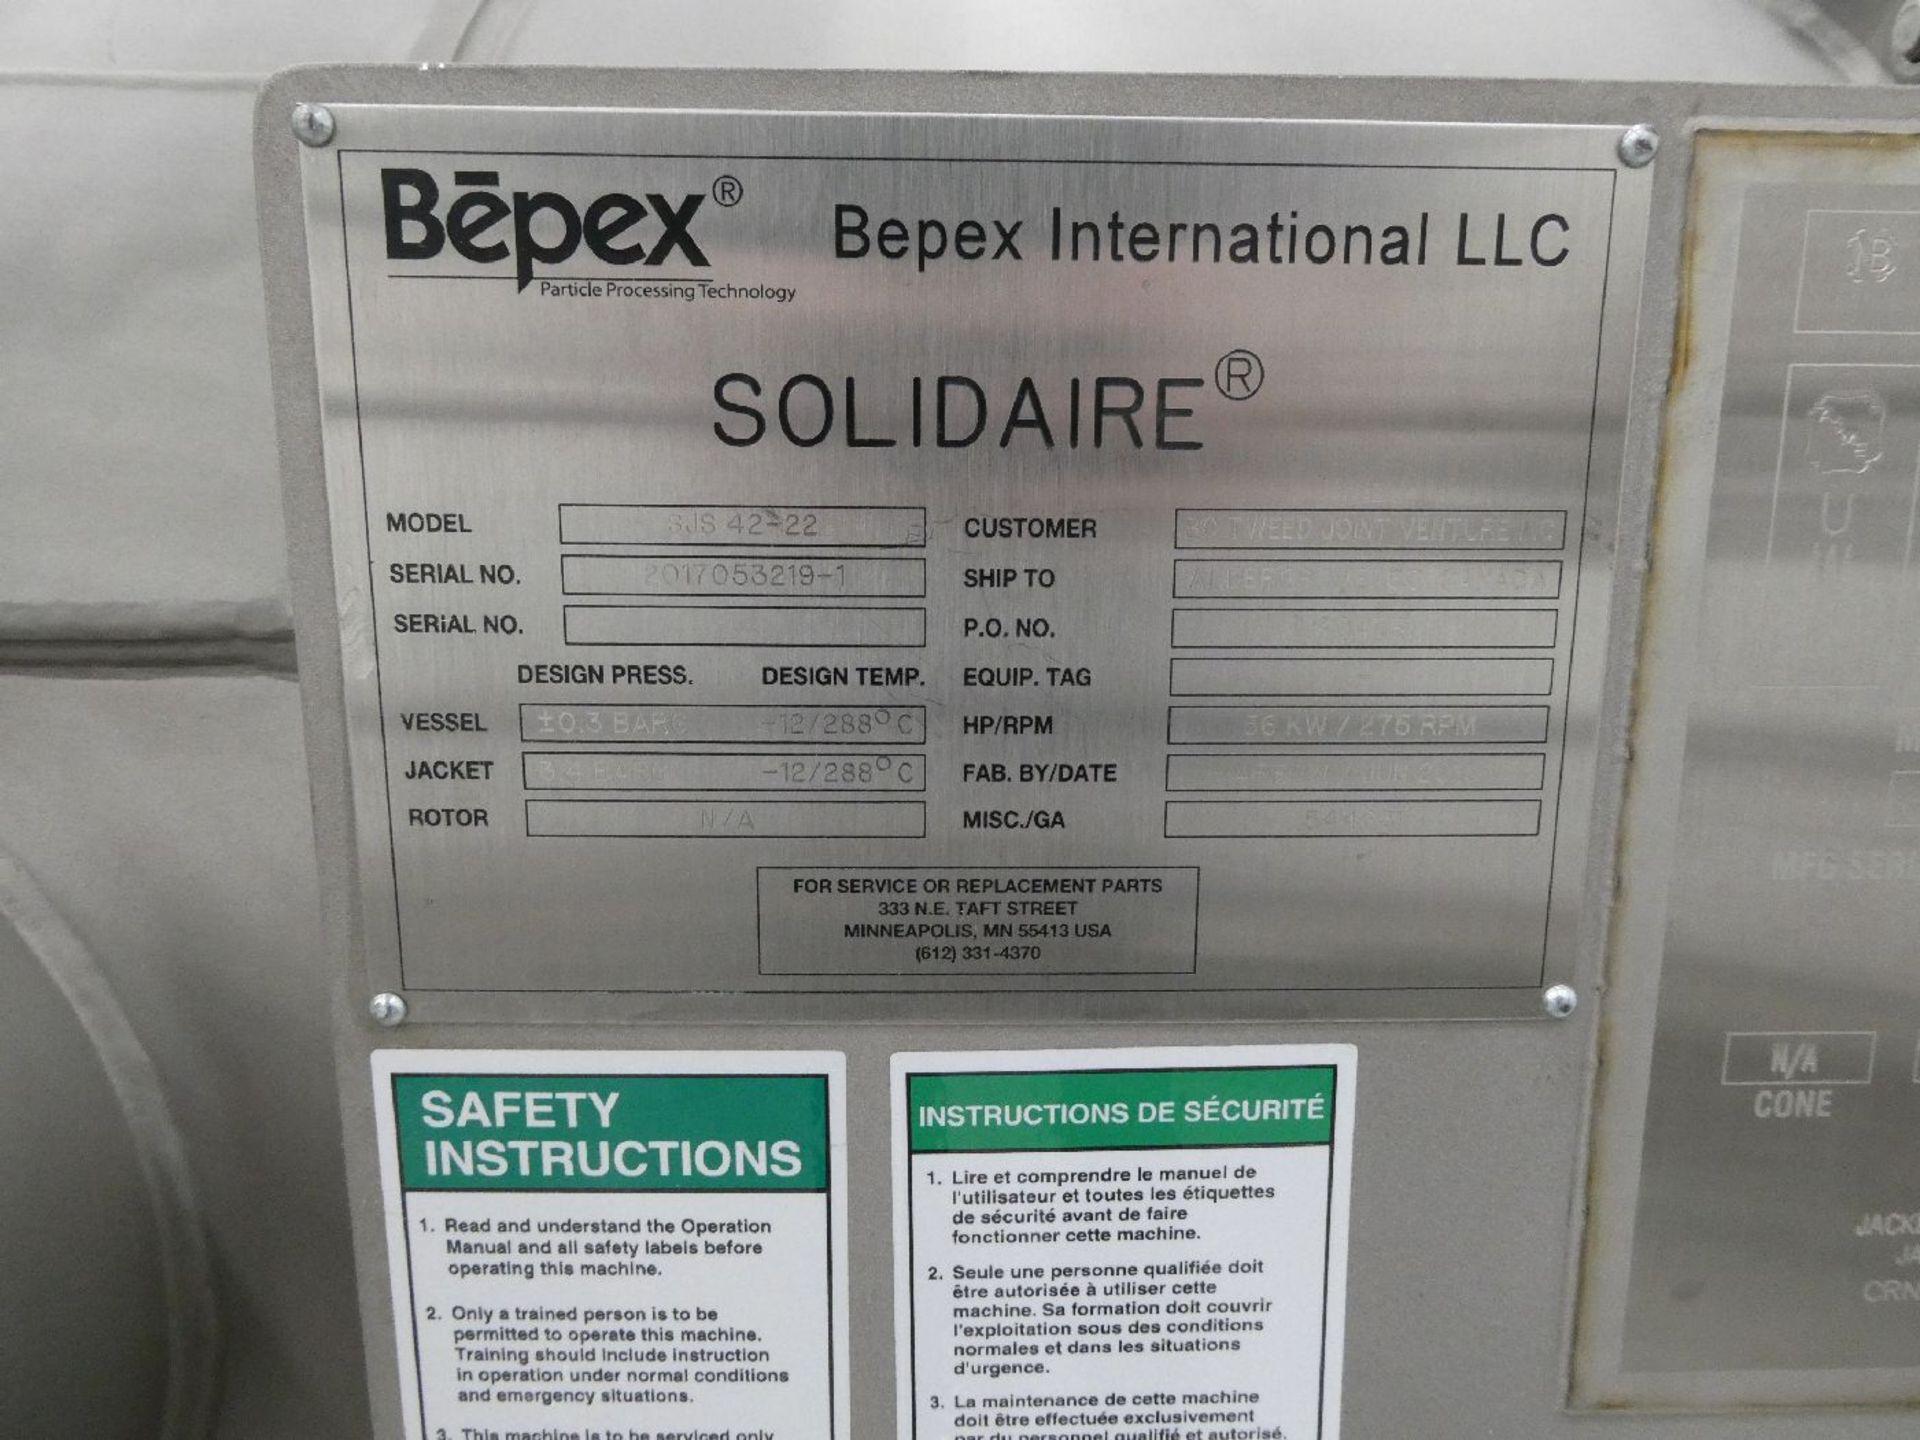 Bepex Room - Image 53 of 67